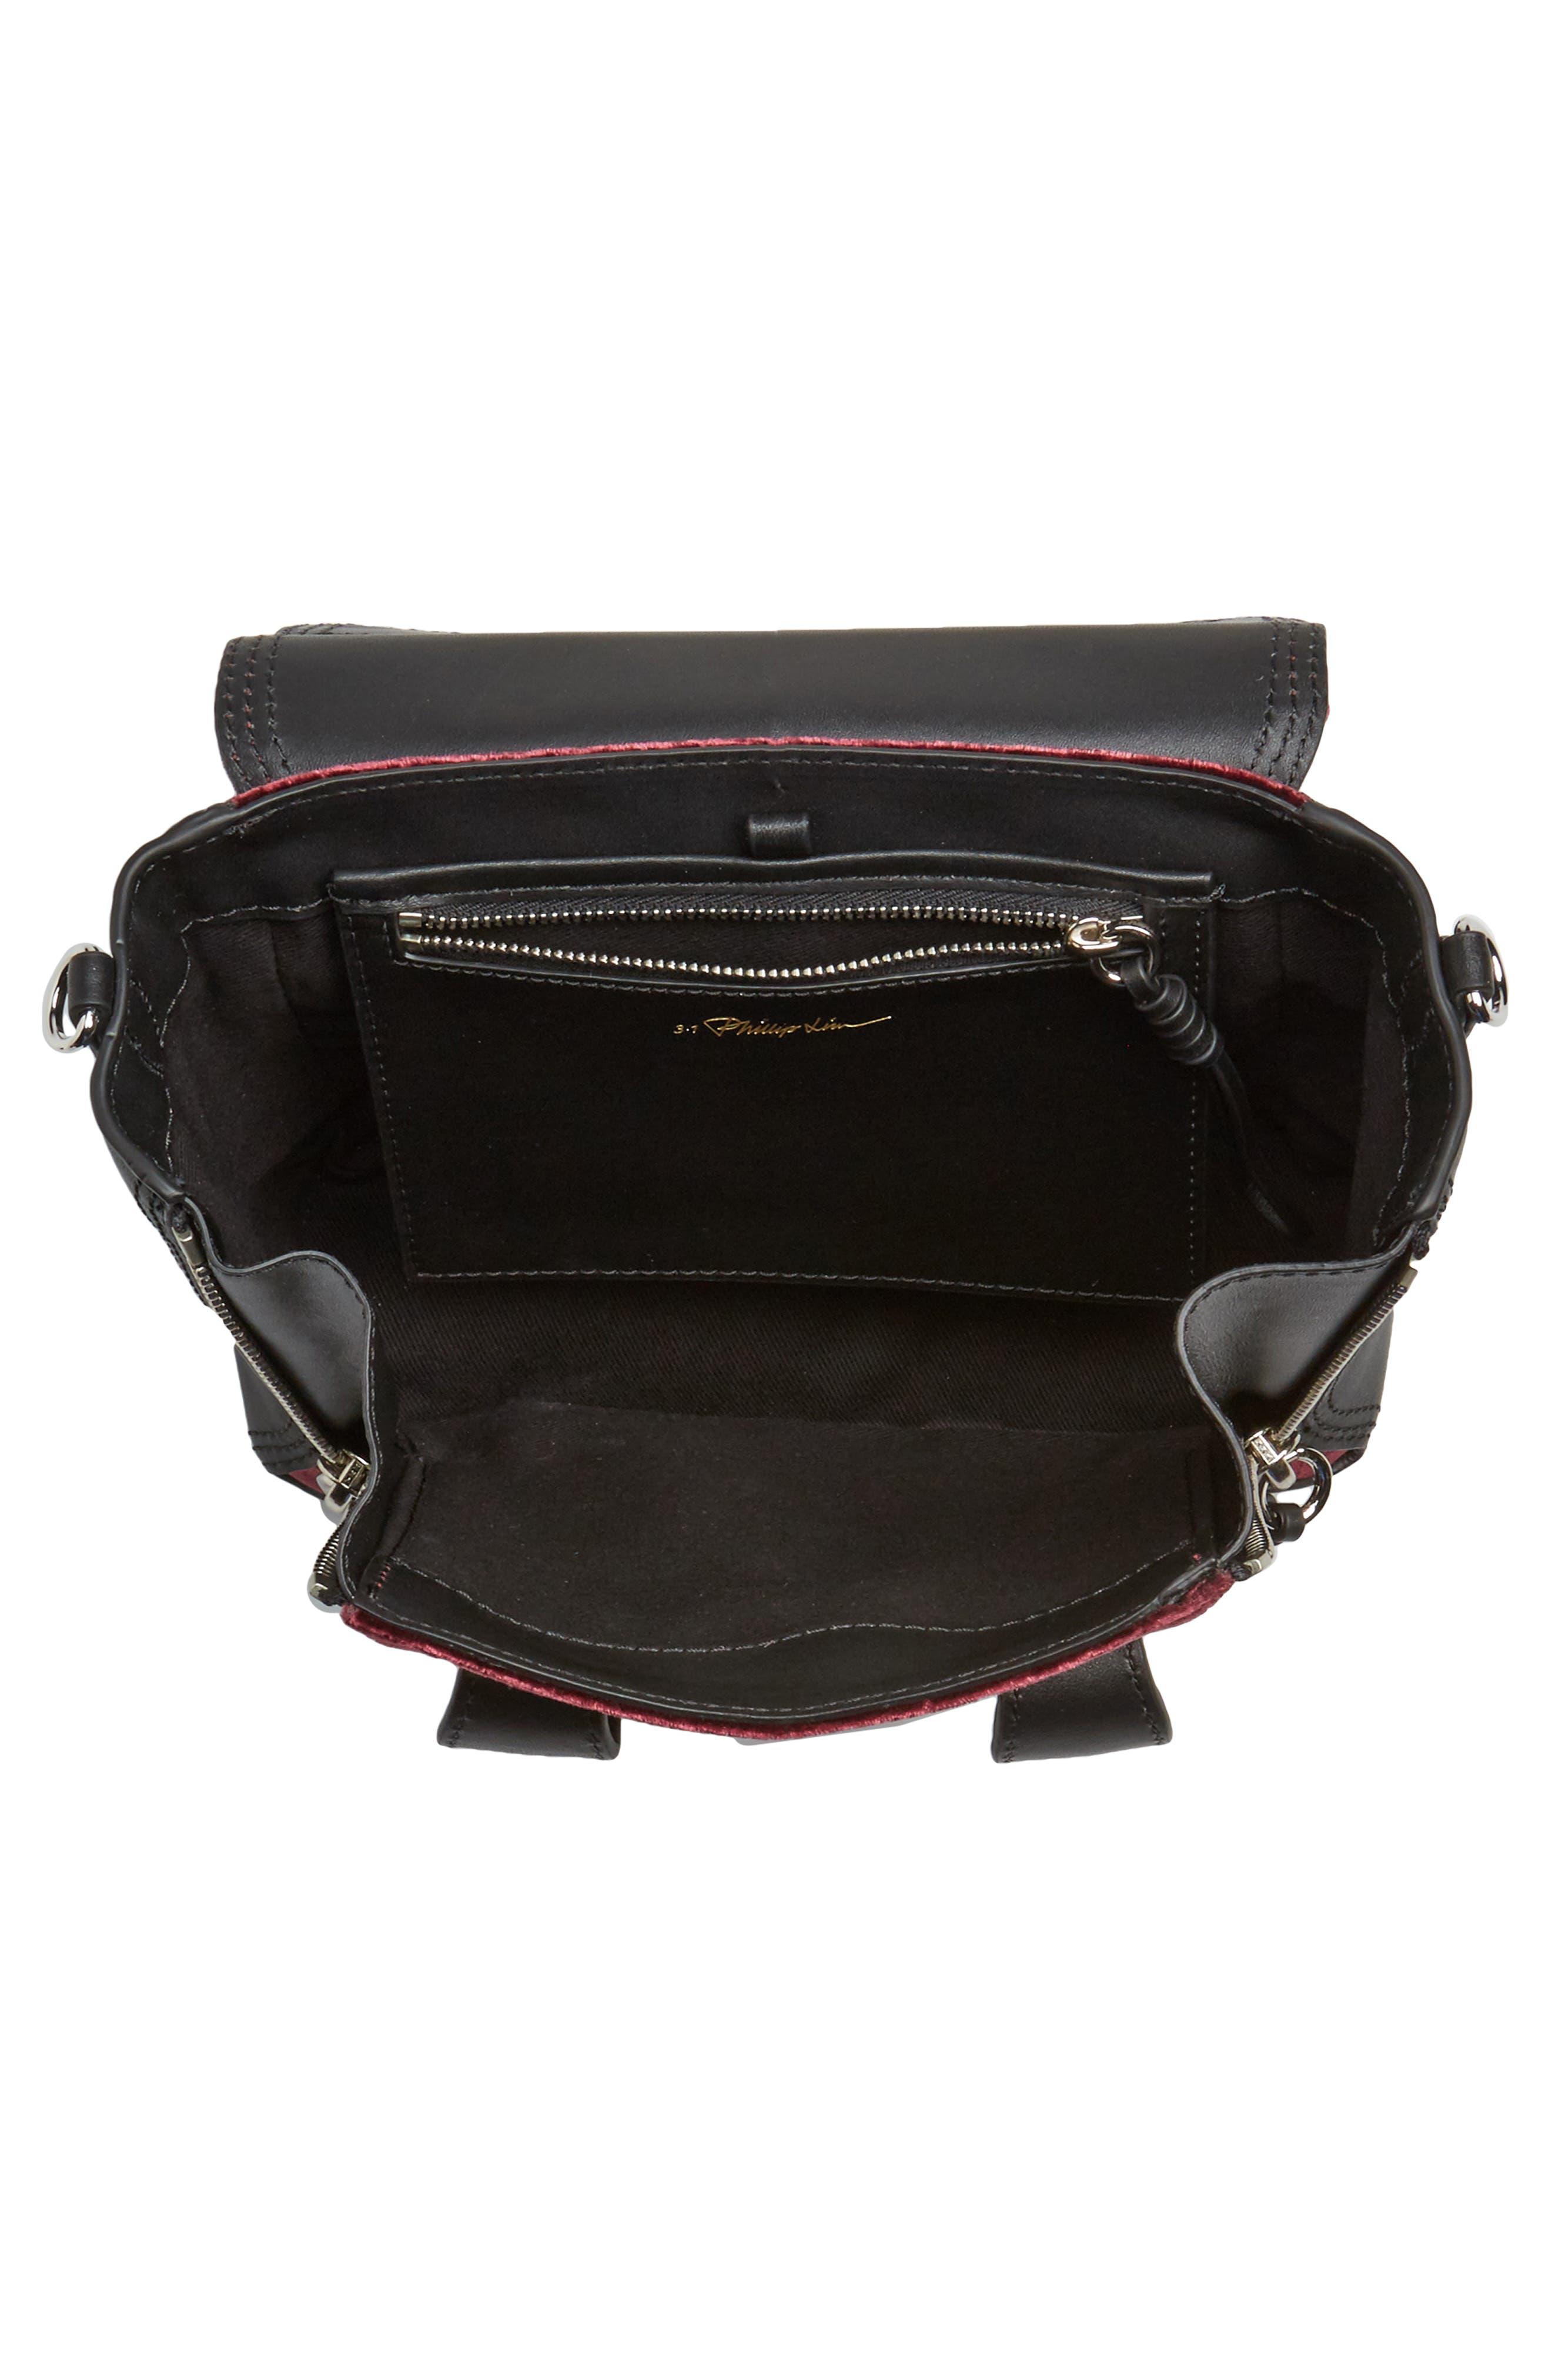 Mini Pashli Velvet & Leather Satchel,                             Alternate thumbnail 4, color,                             670